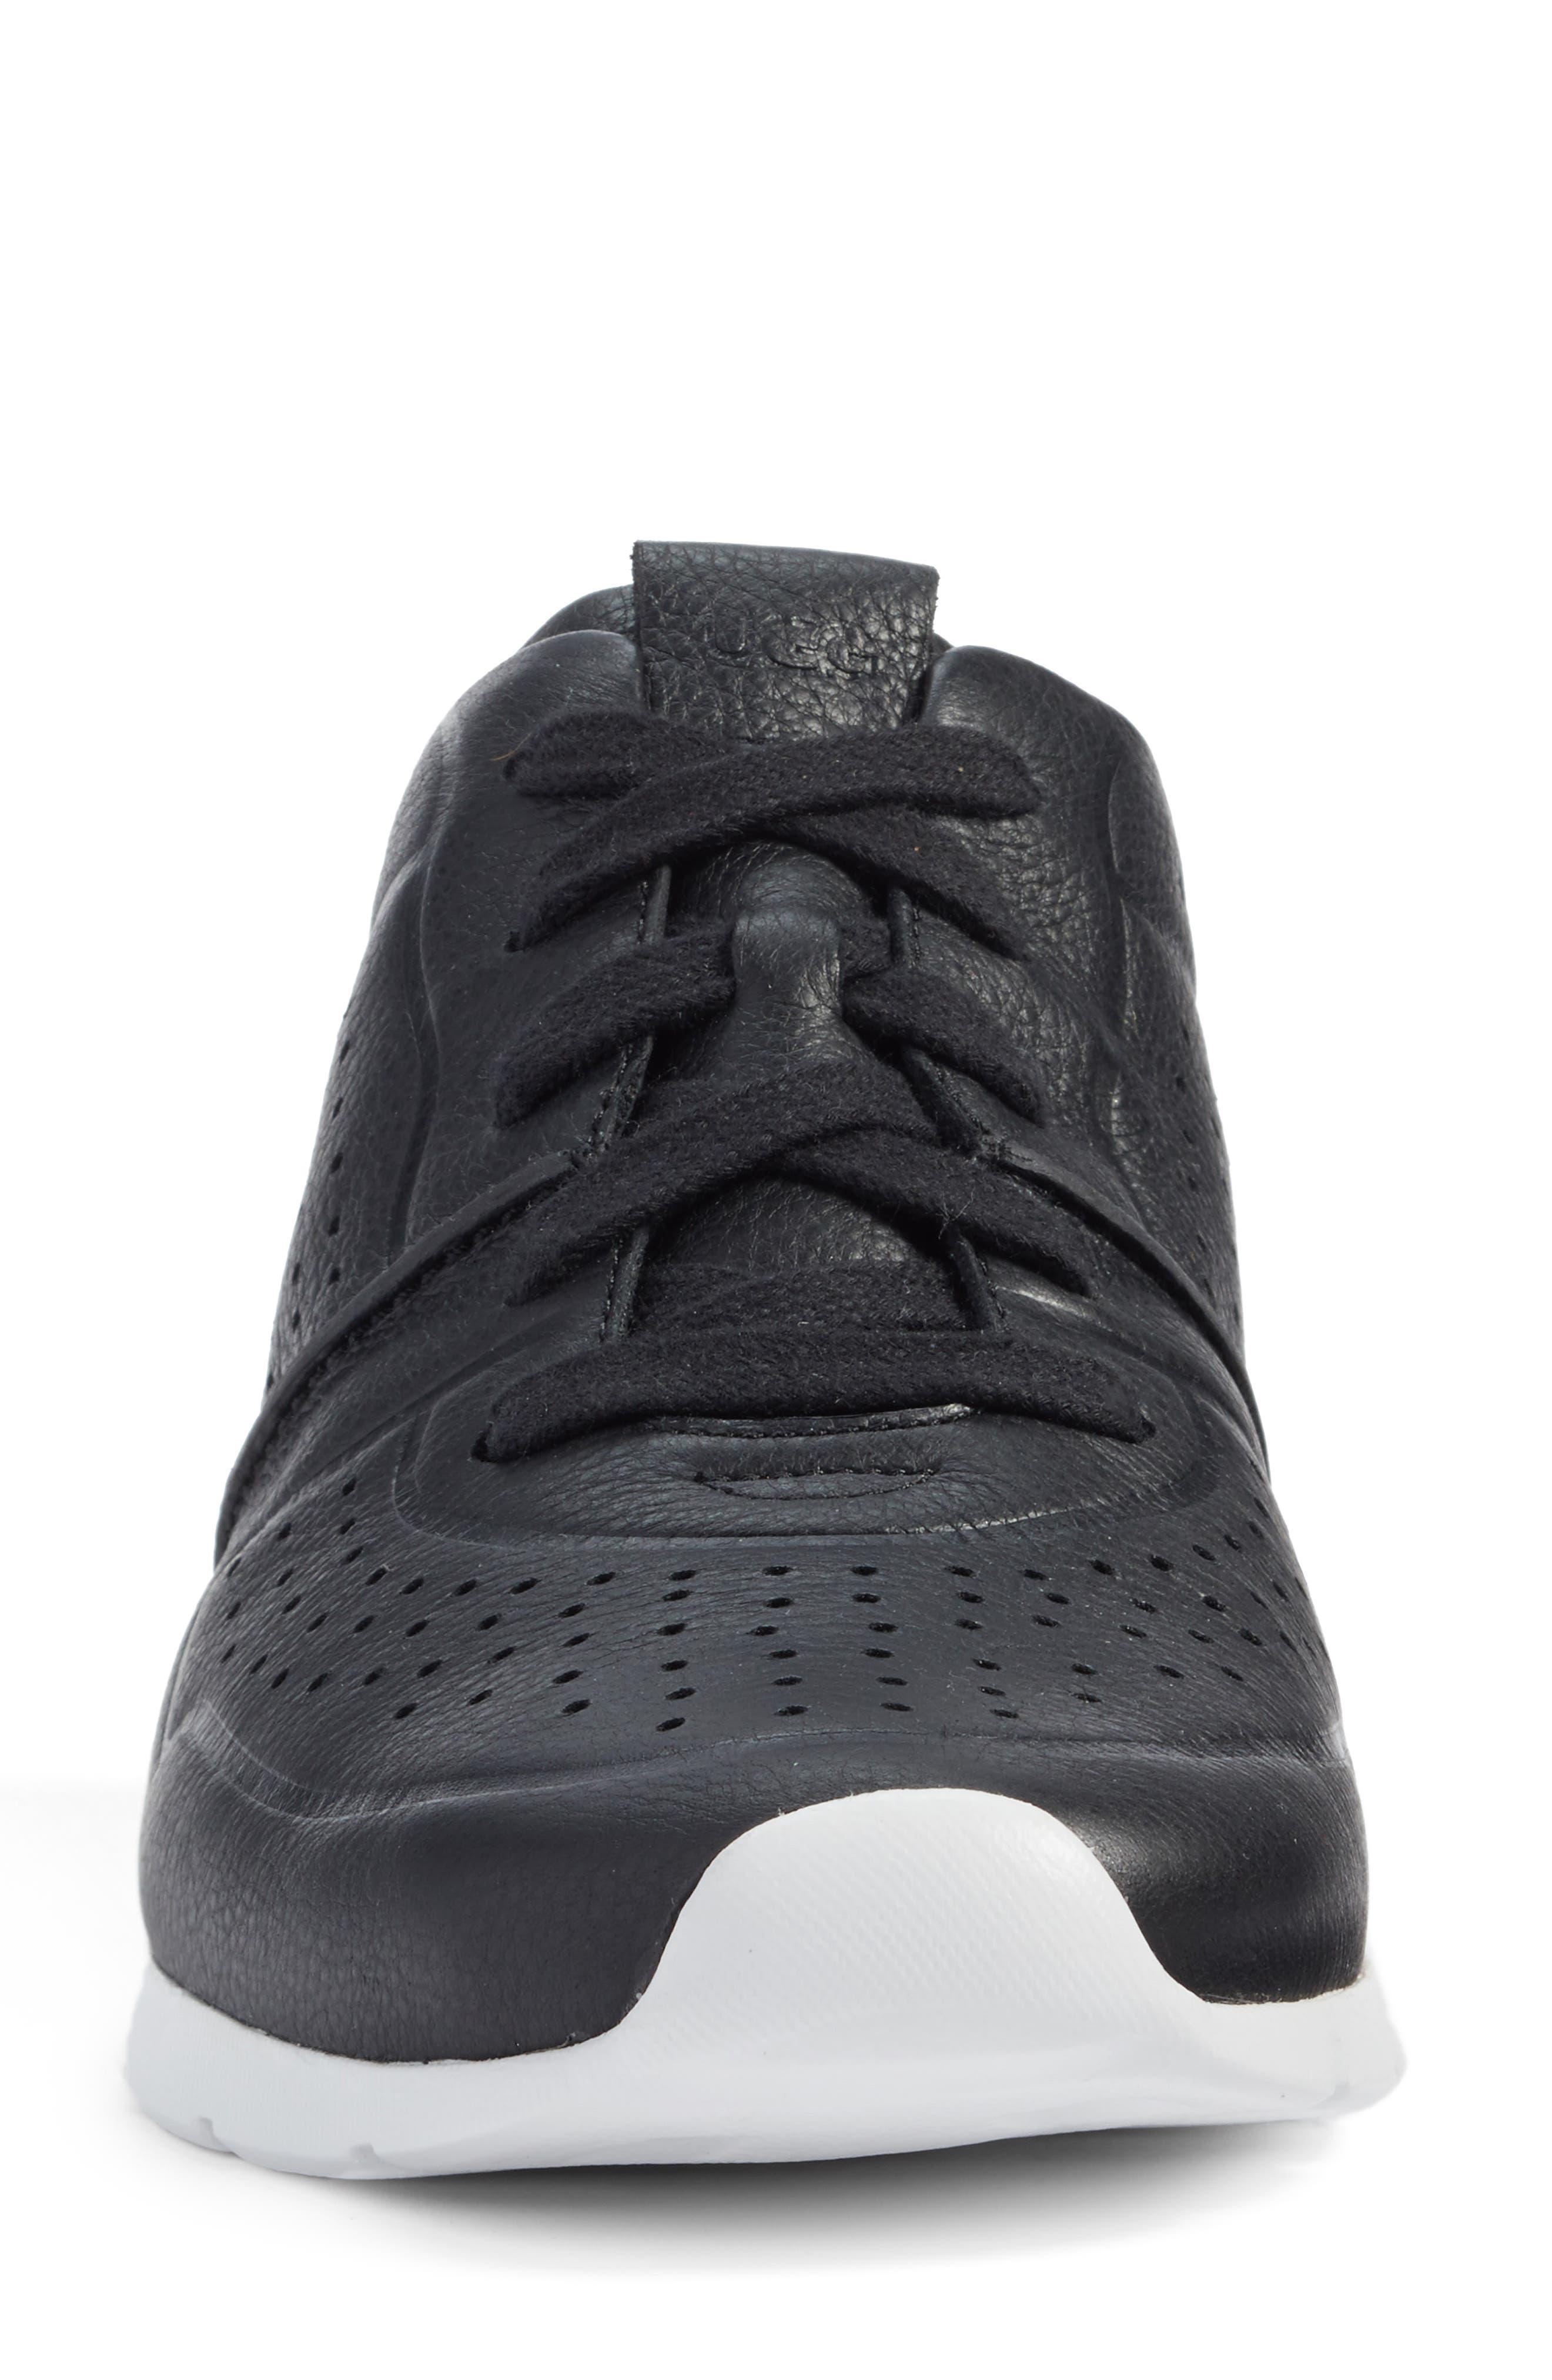 Tye Sneaker,                             Alternate thumbnail 4, color,                             001